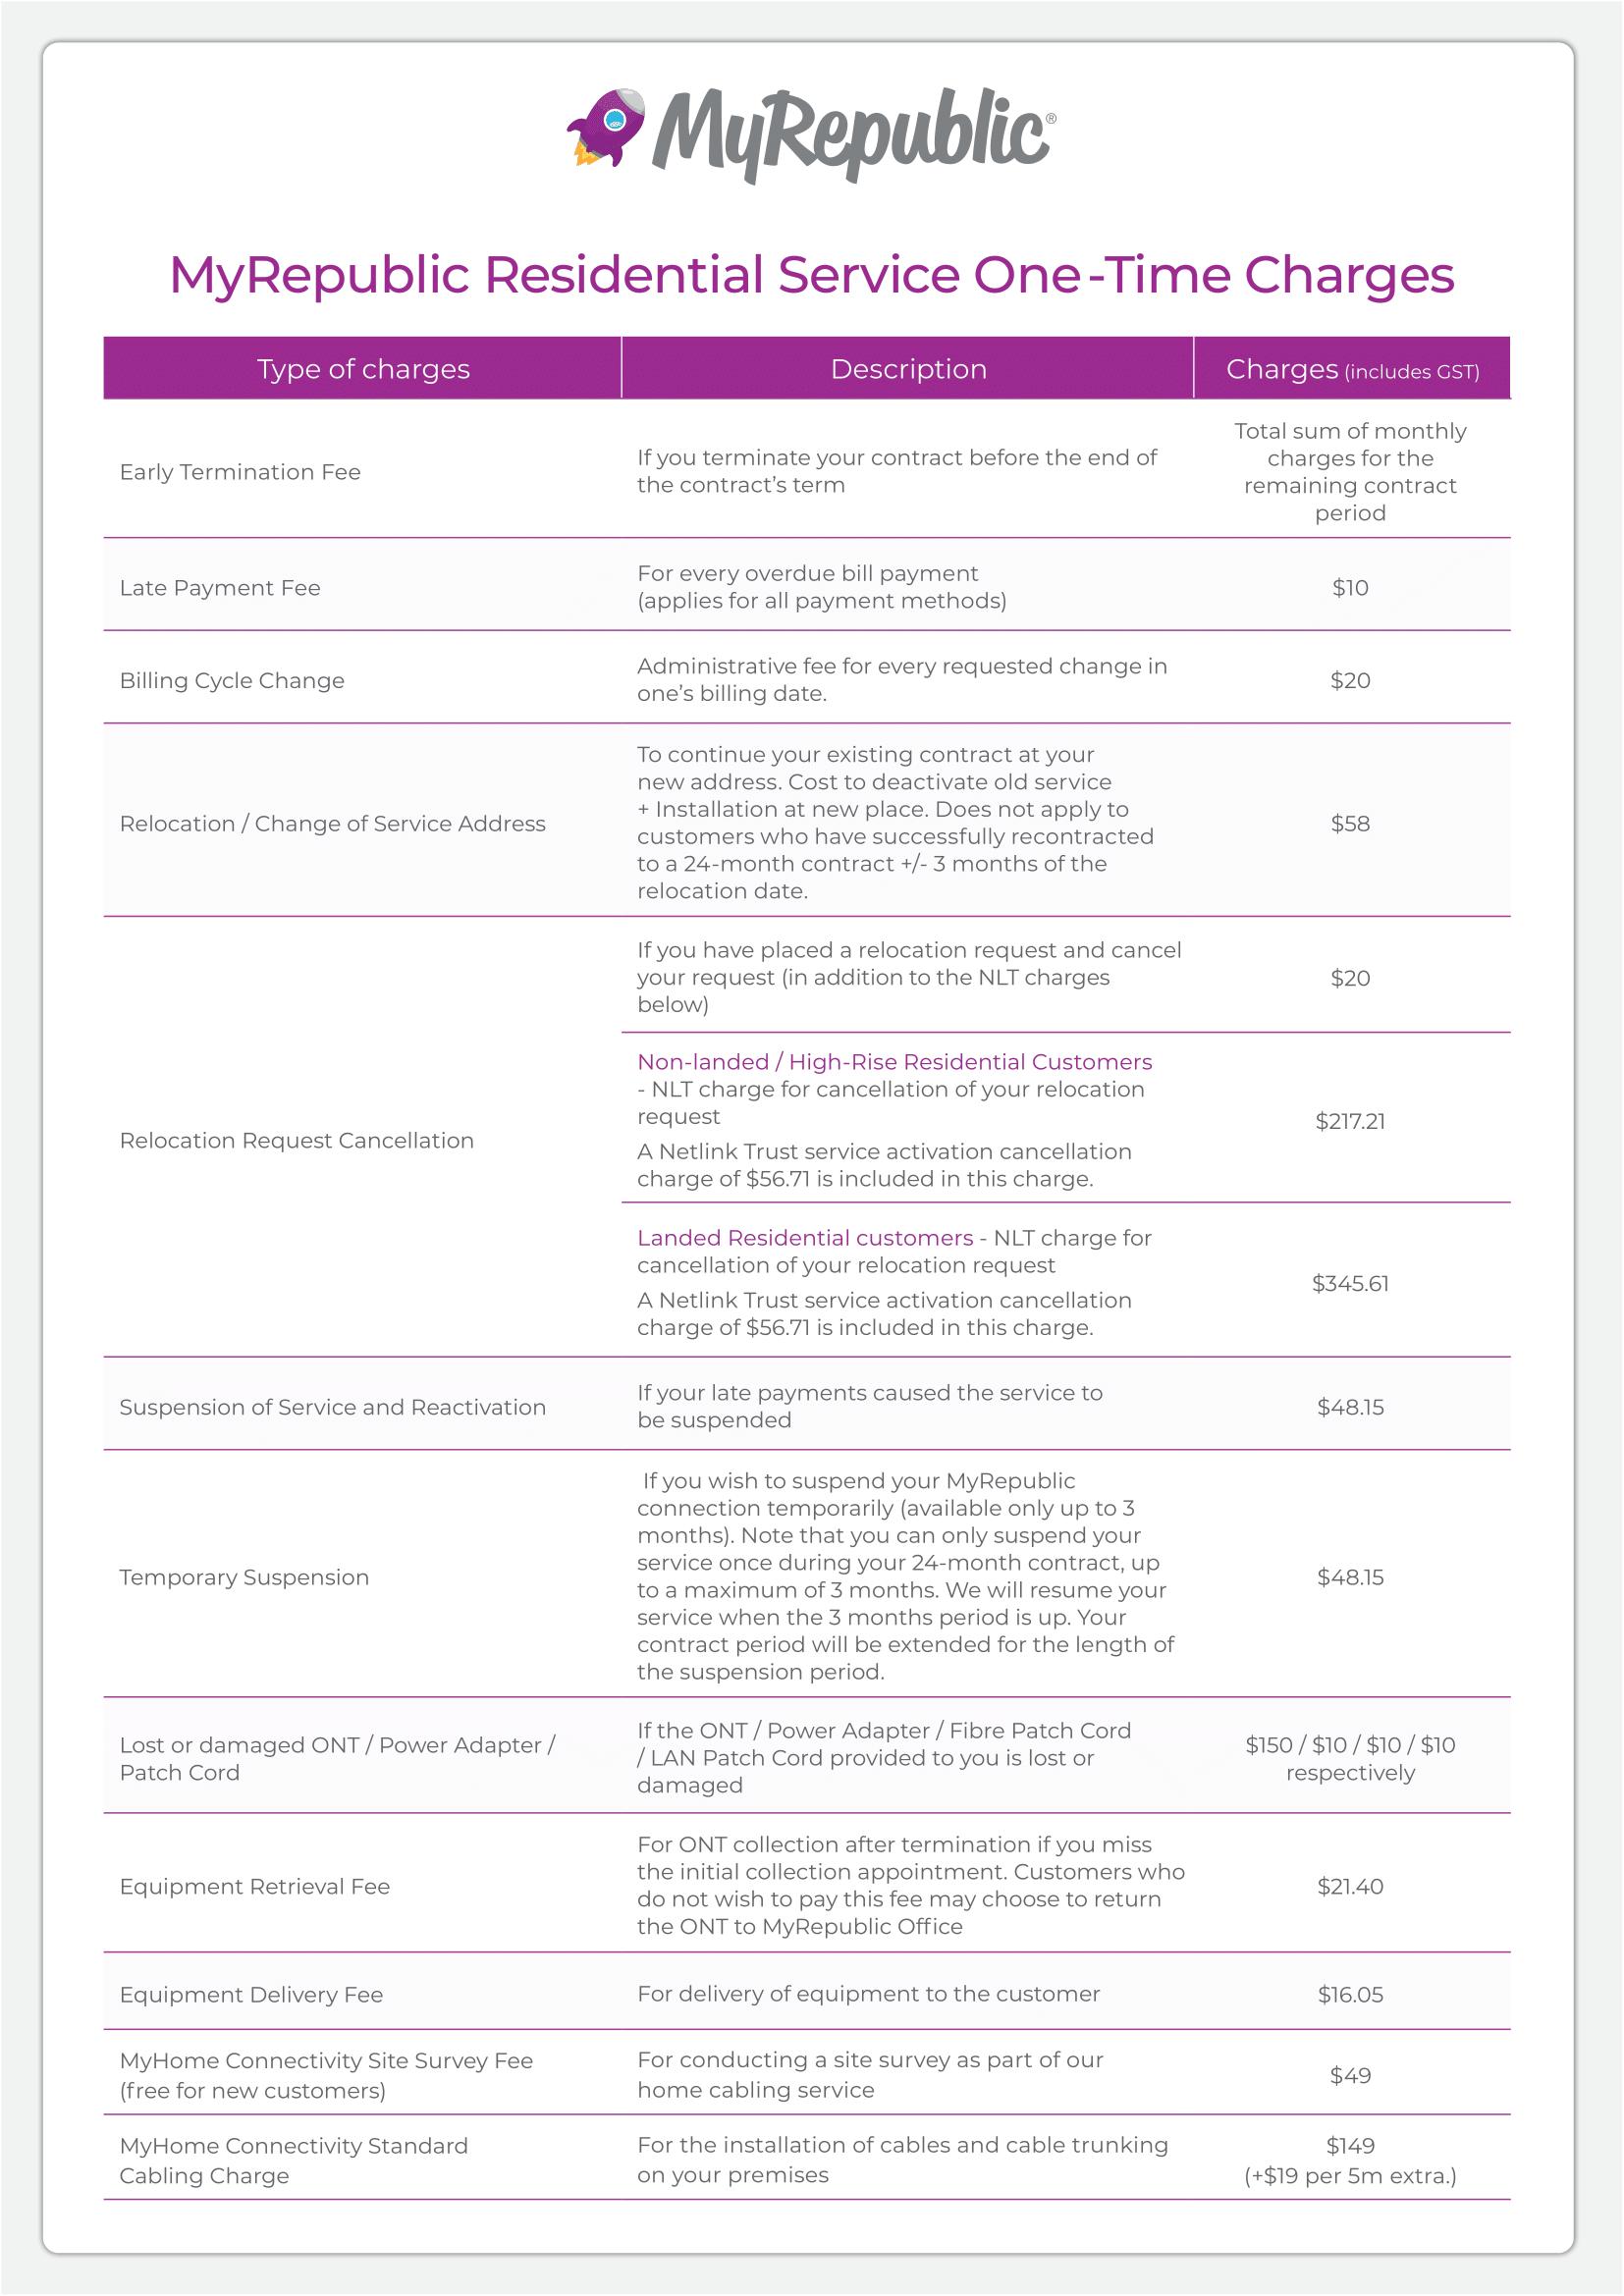 MyRepublic One-Time Charges